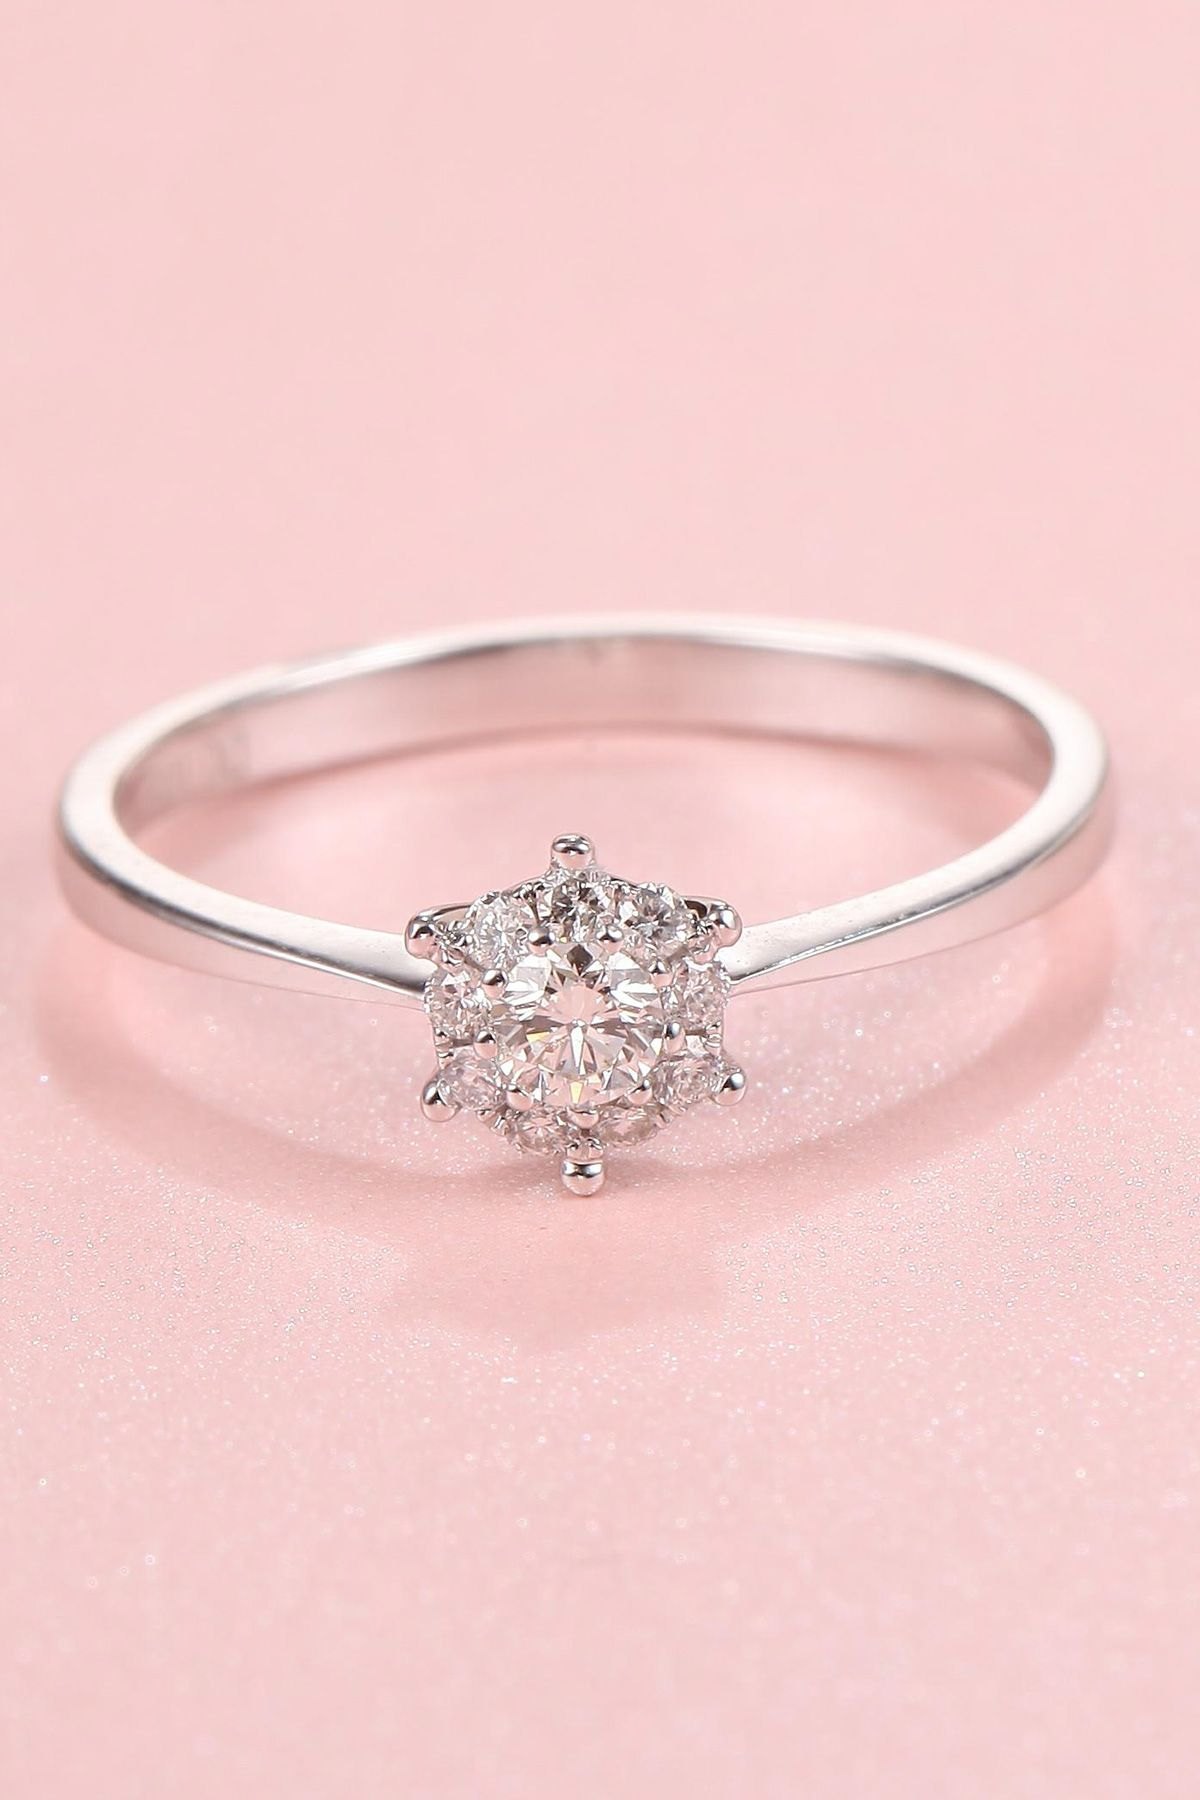 diamond ring | LIFESTYLE | Pinterest | Diamond, Ring and Simple ...